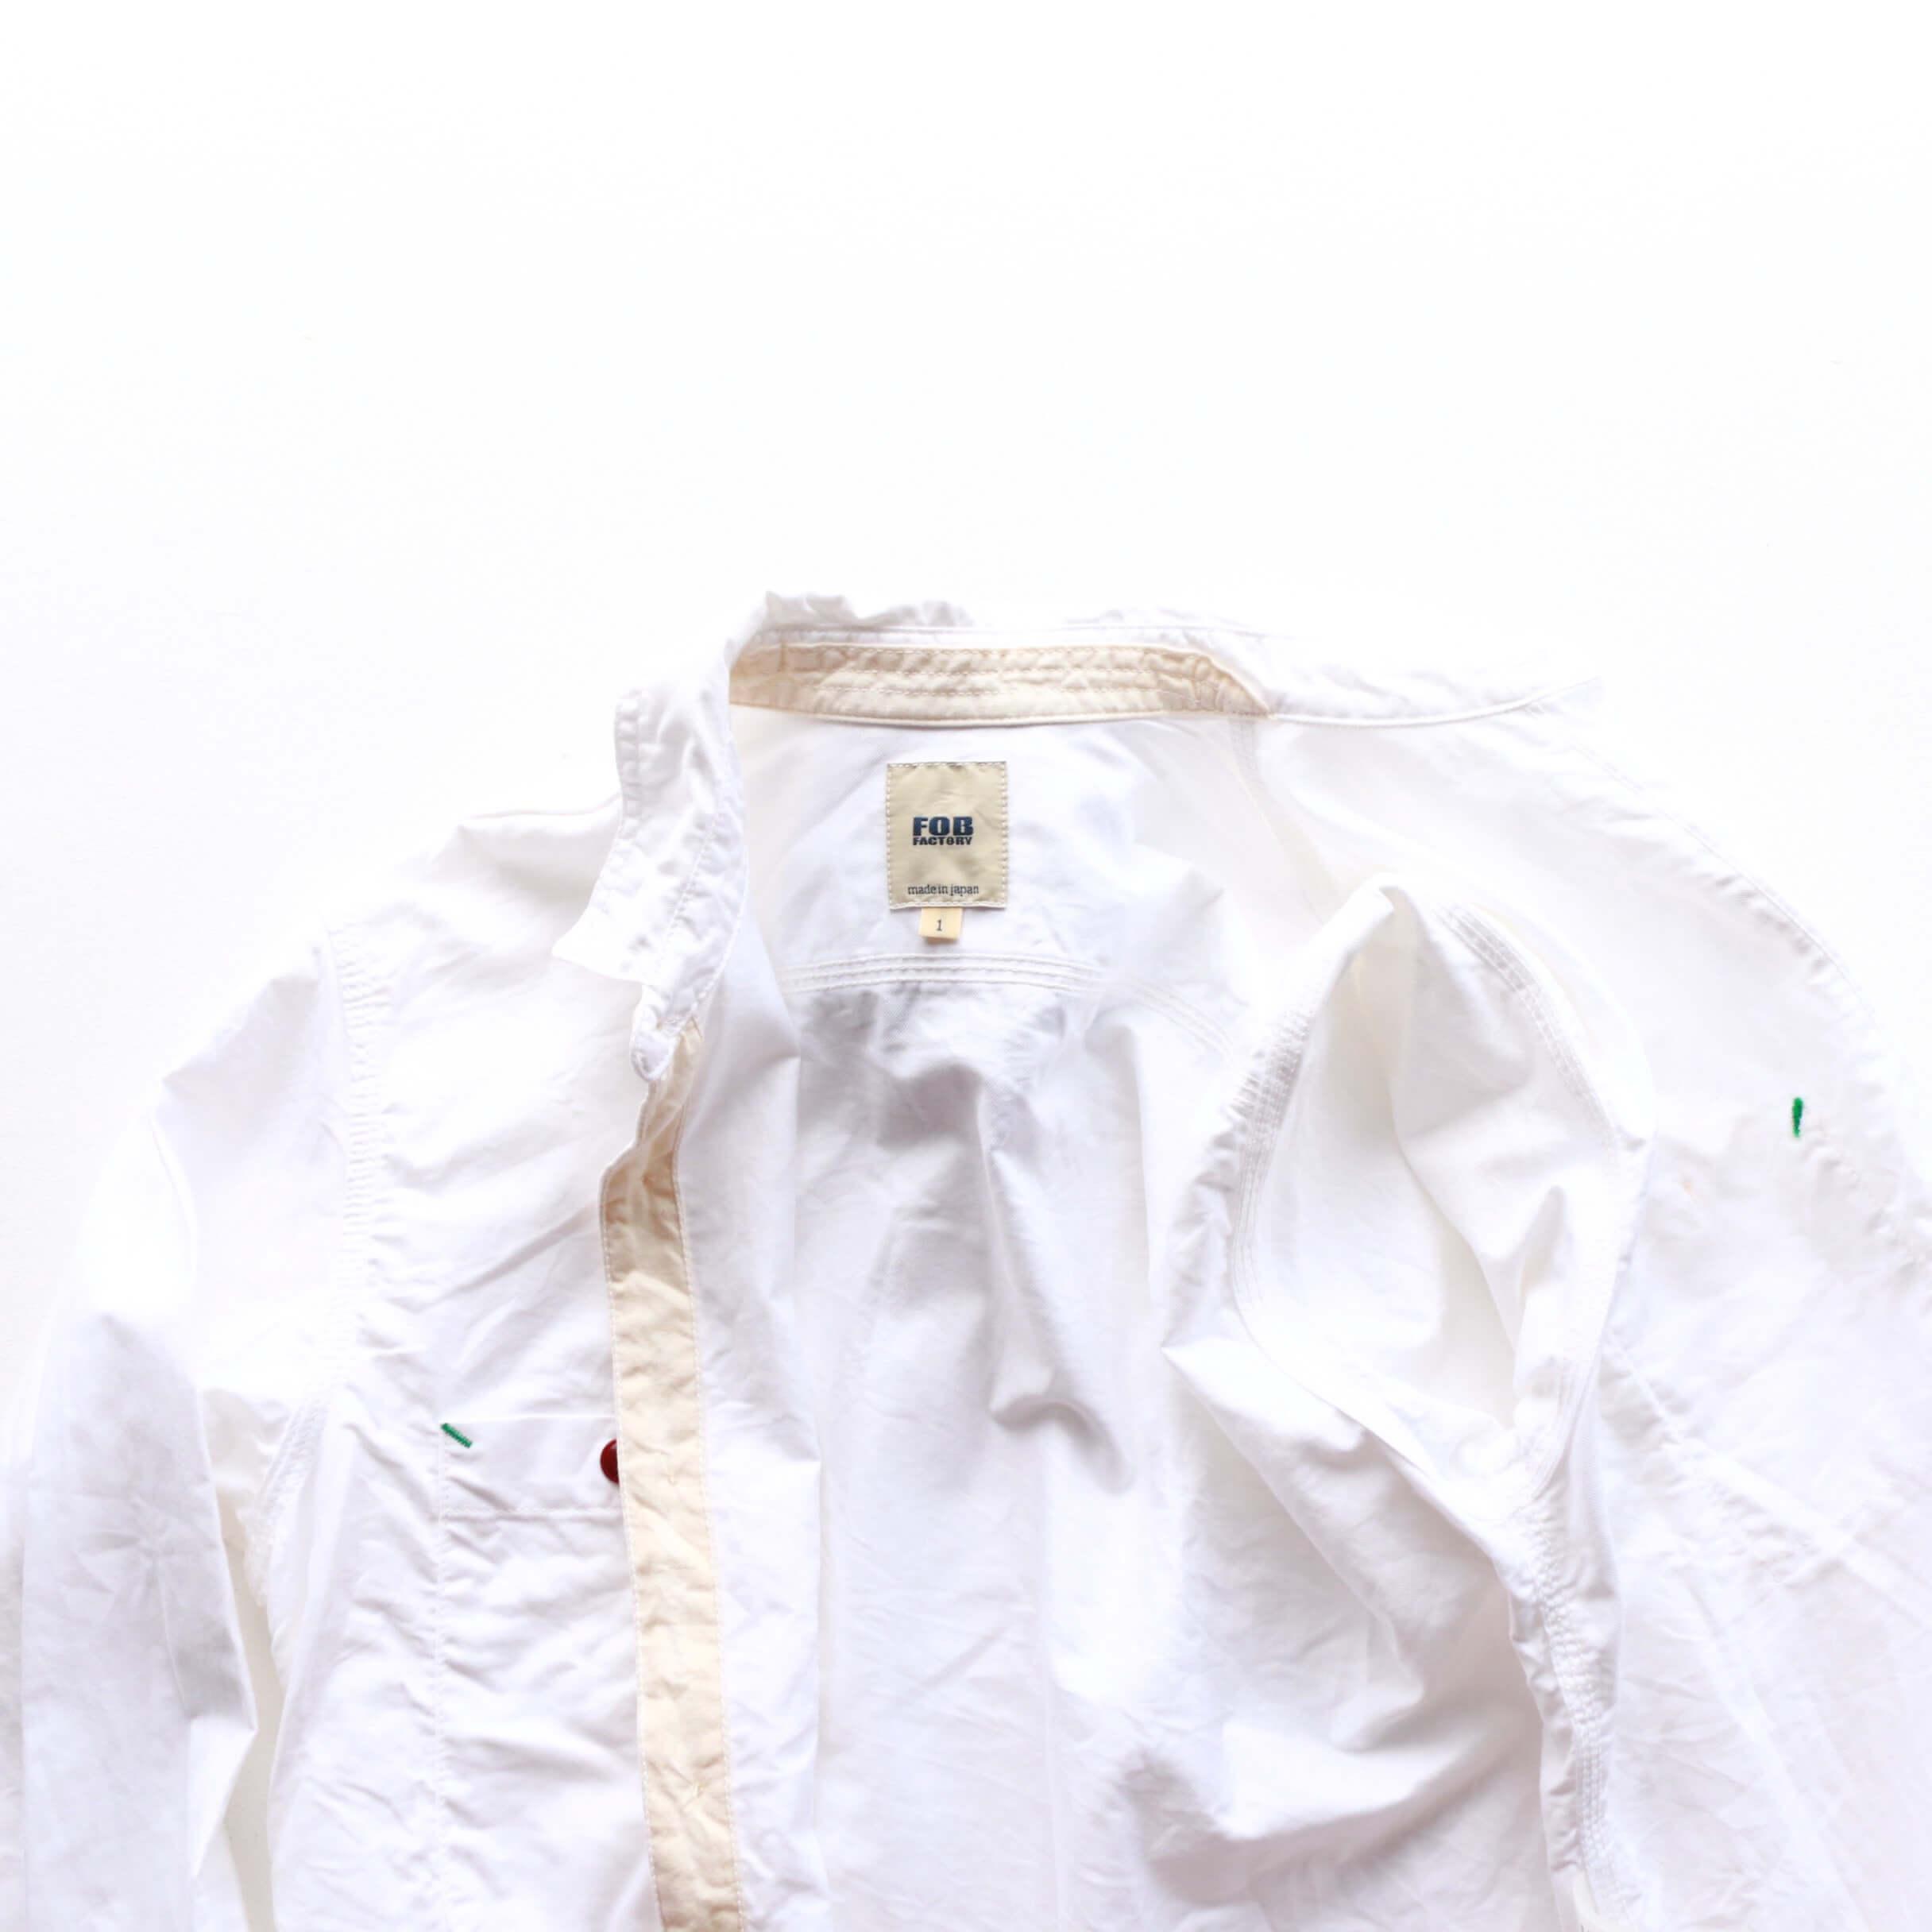 FOB FACTORY エフオービーファクトリー ROYAL OXFORD WORK SHIRTS ロイヤルオックスフォードワークシャツ F3193